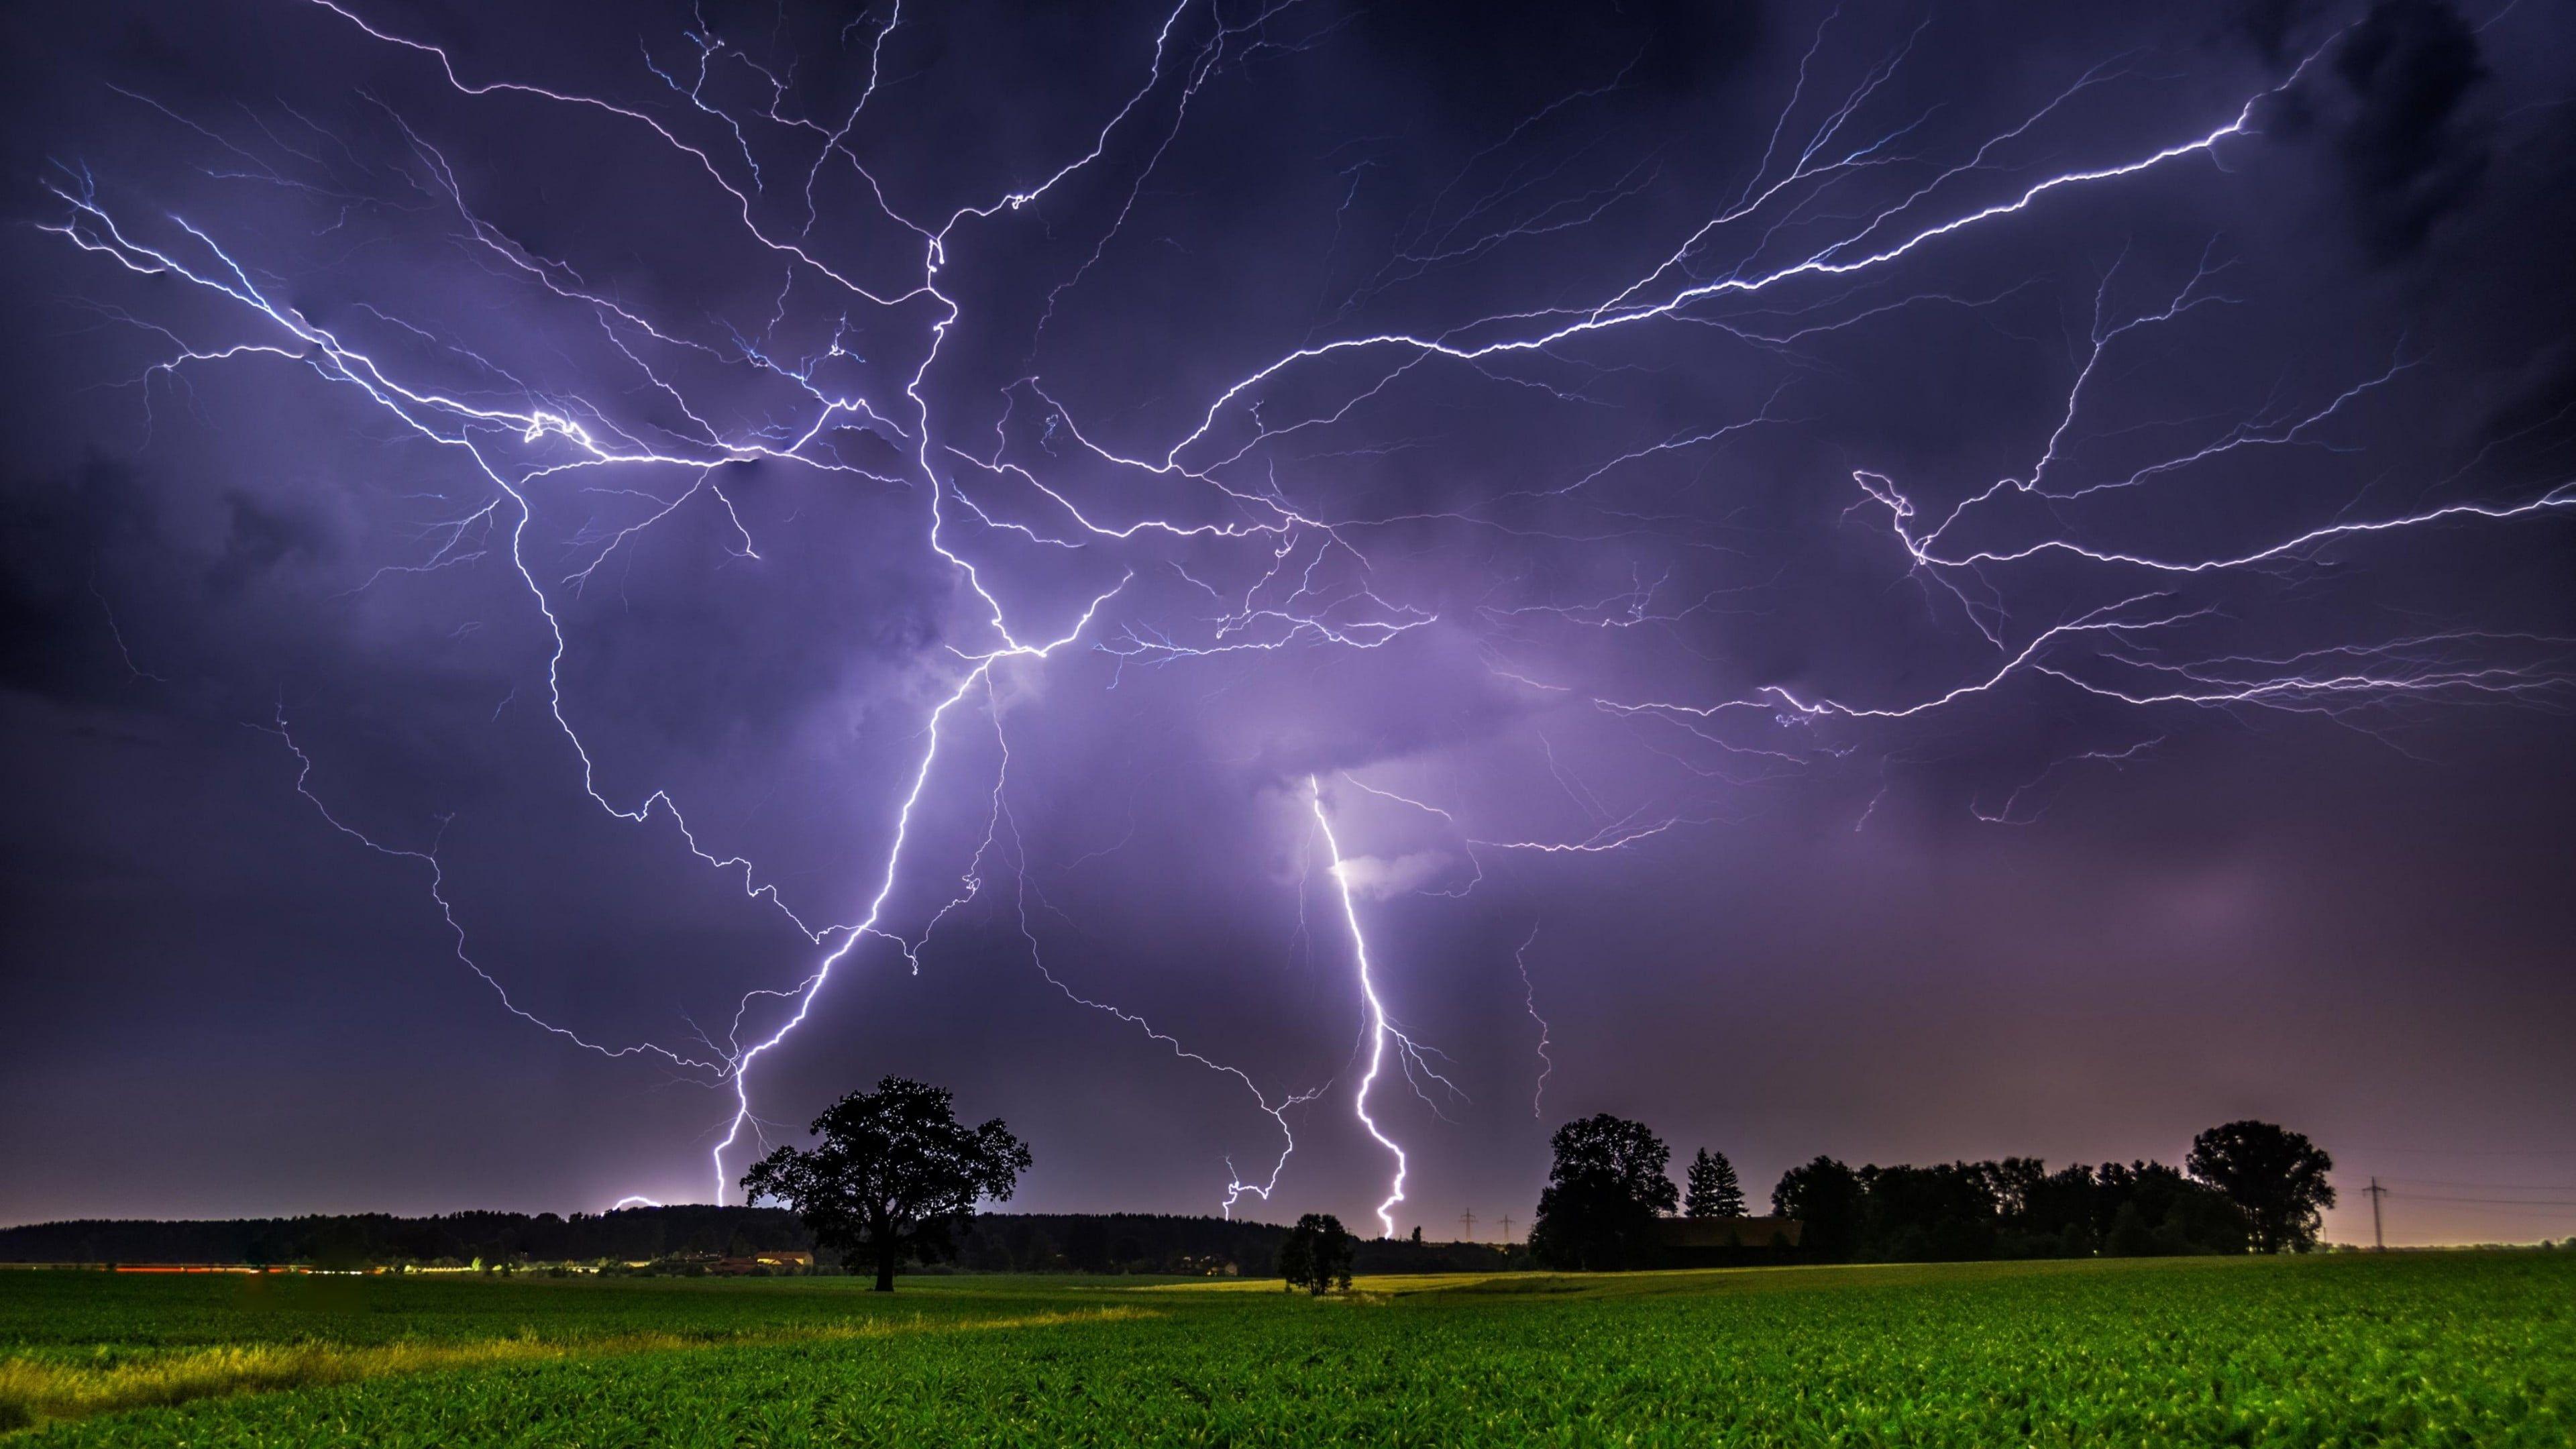 Lightning Thunder Thunderstorm Cloud Storm Landscape Night Evening Darkness 4k Wallpape Storm Wallpaper Storm Photography Thunderstorm And Lightning